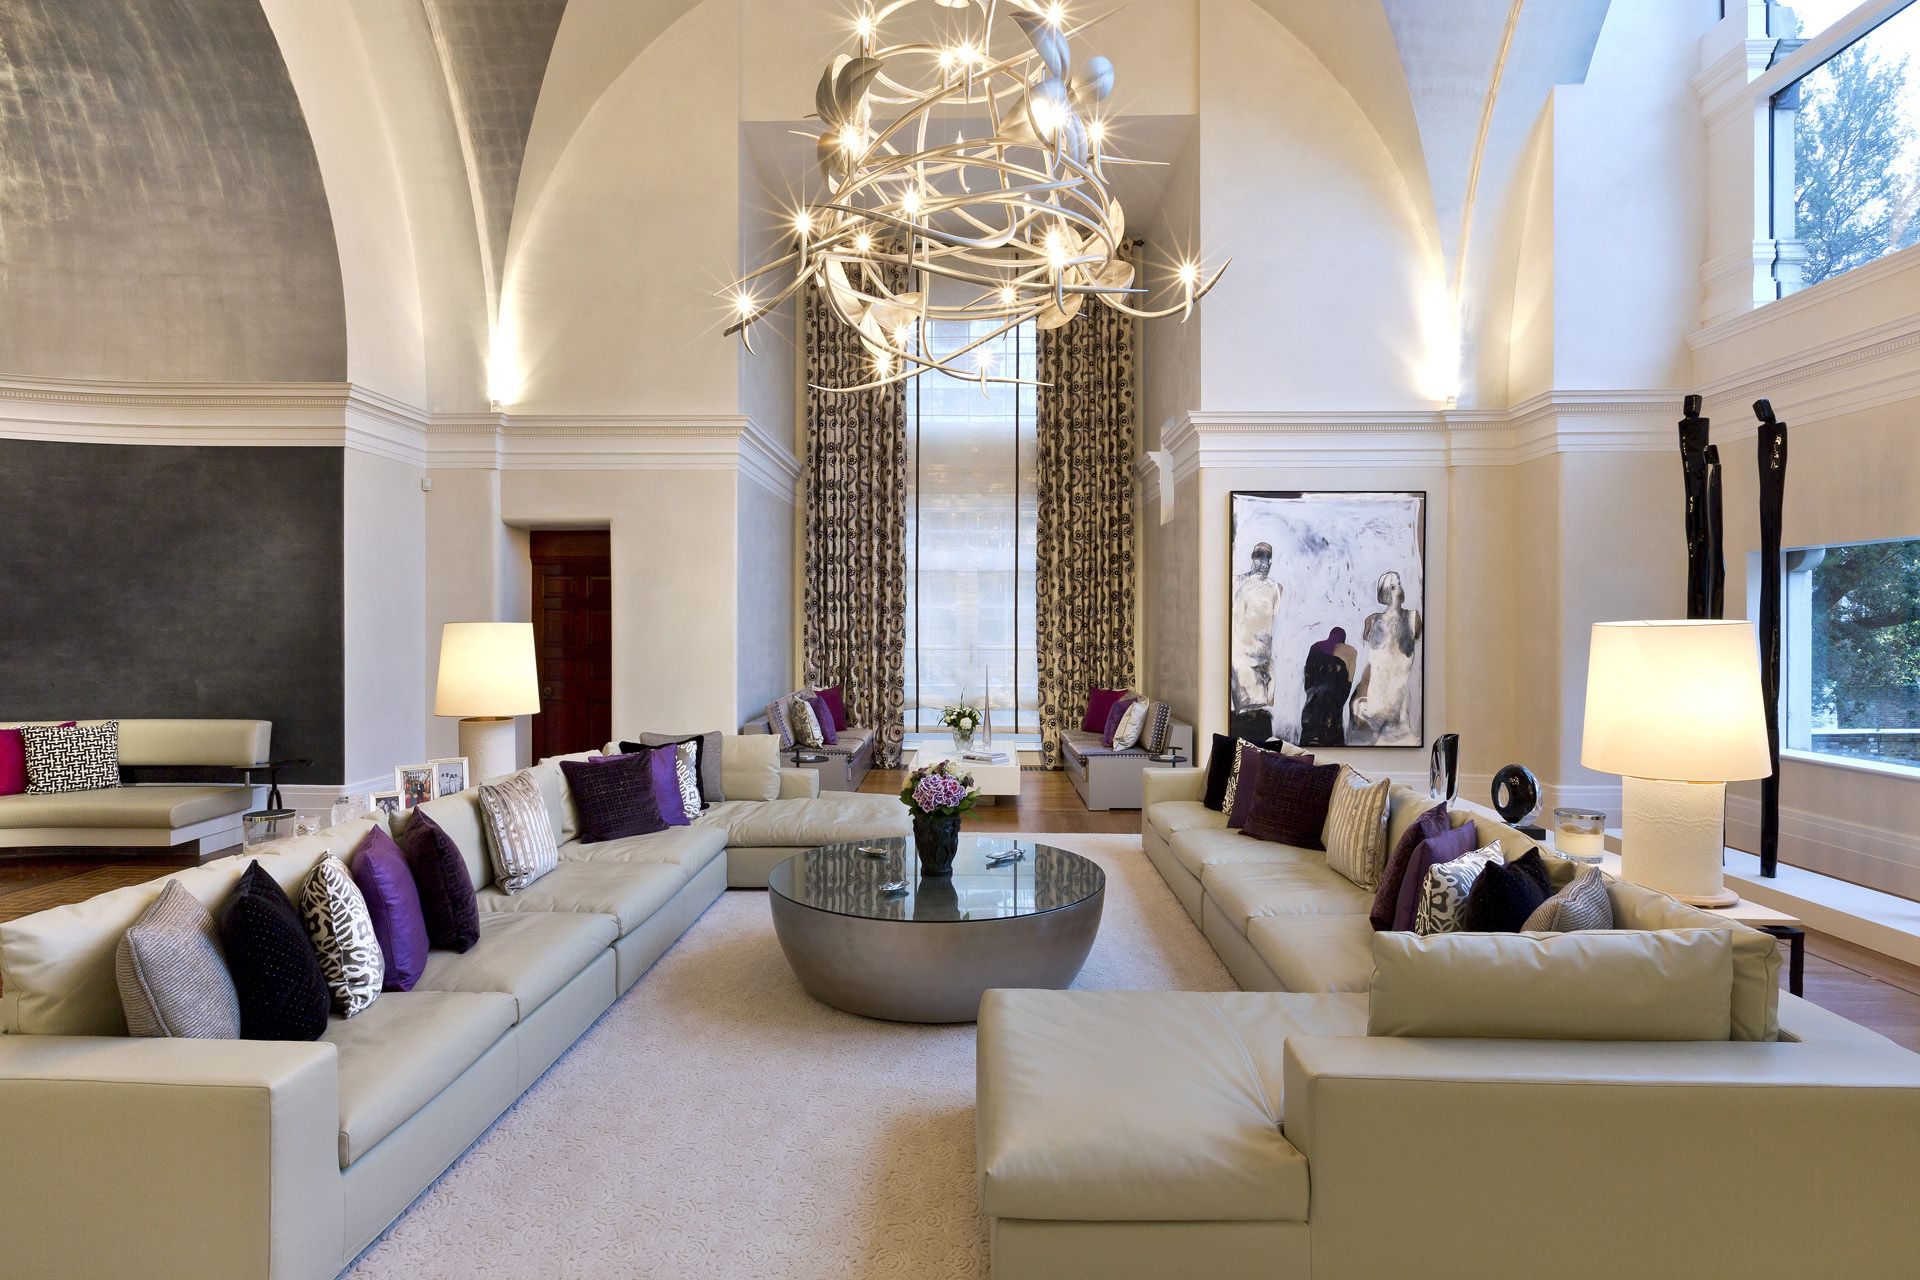 Beautiful un salon de luxe images awesome interior home satellite for Un salon de luxe